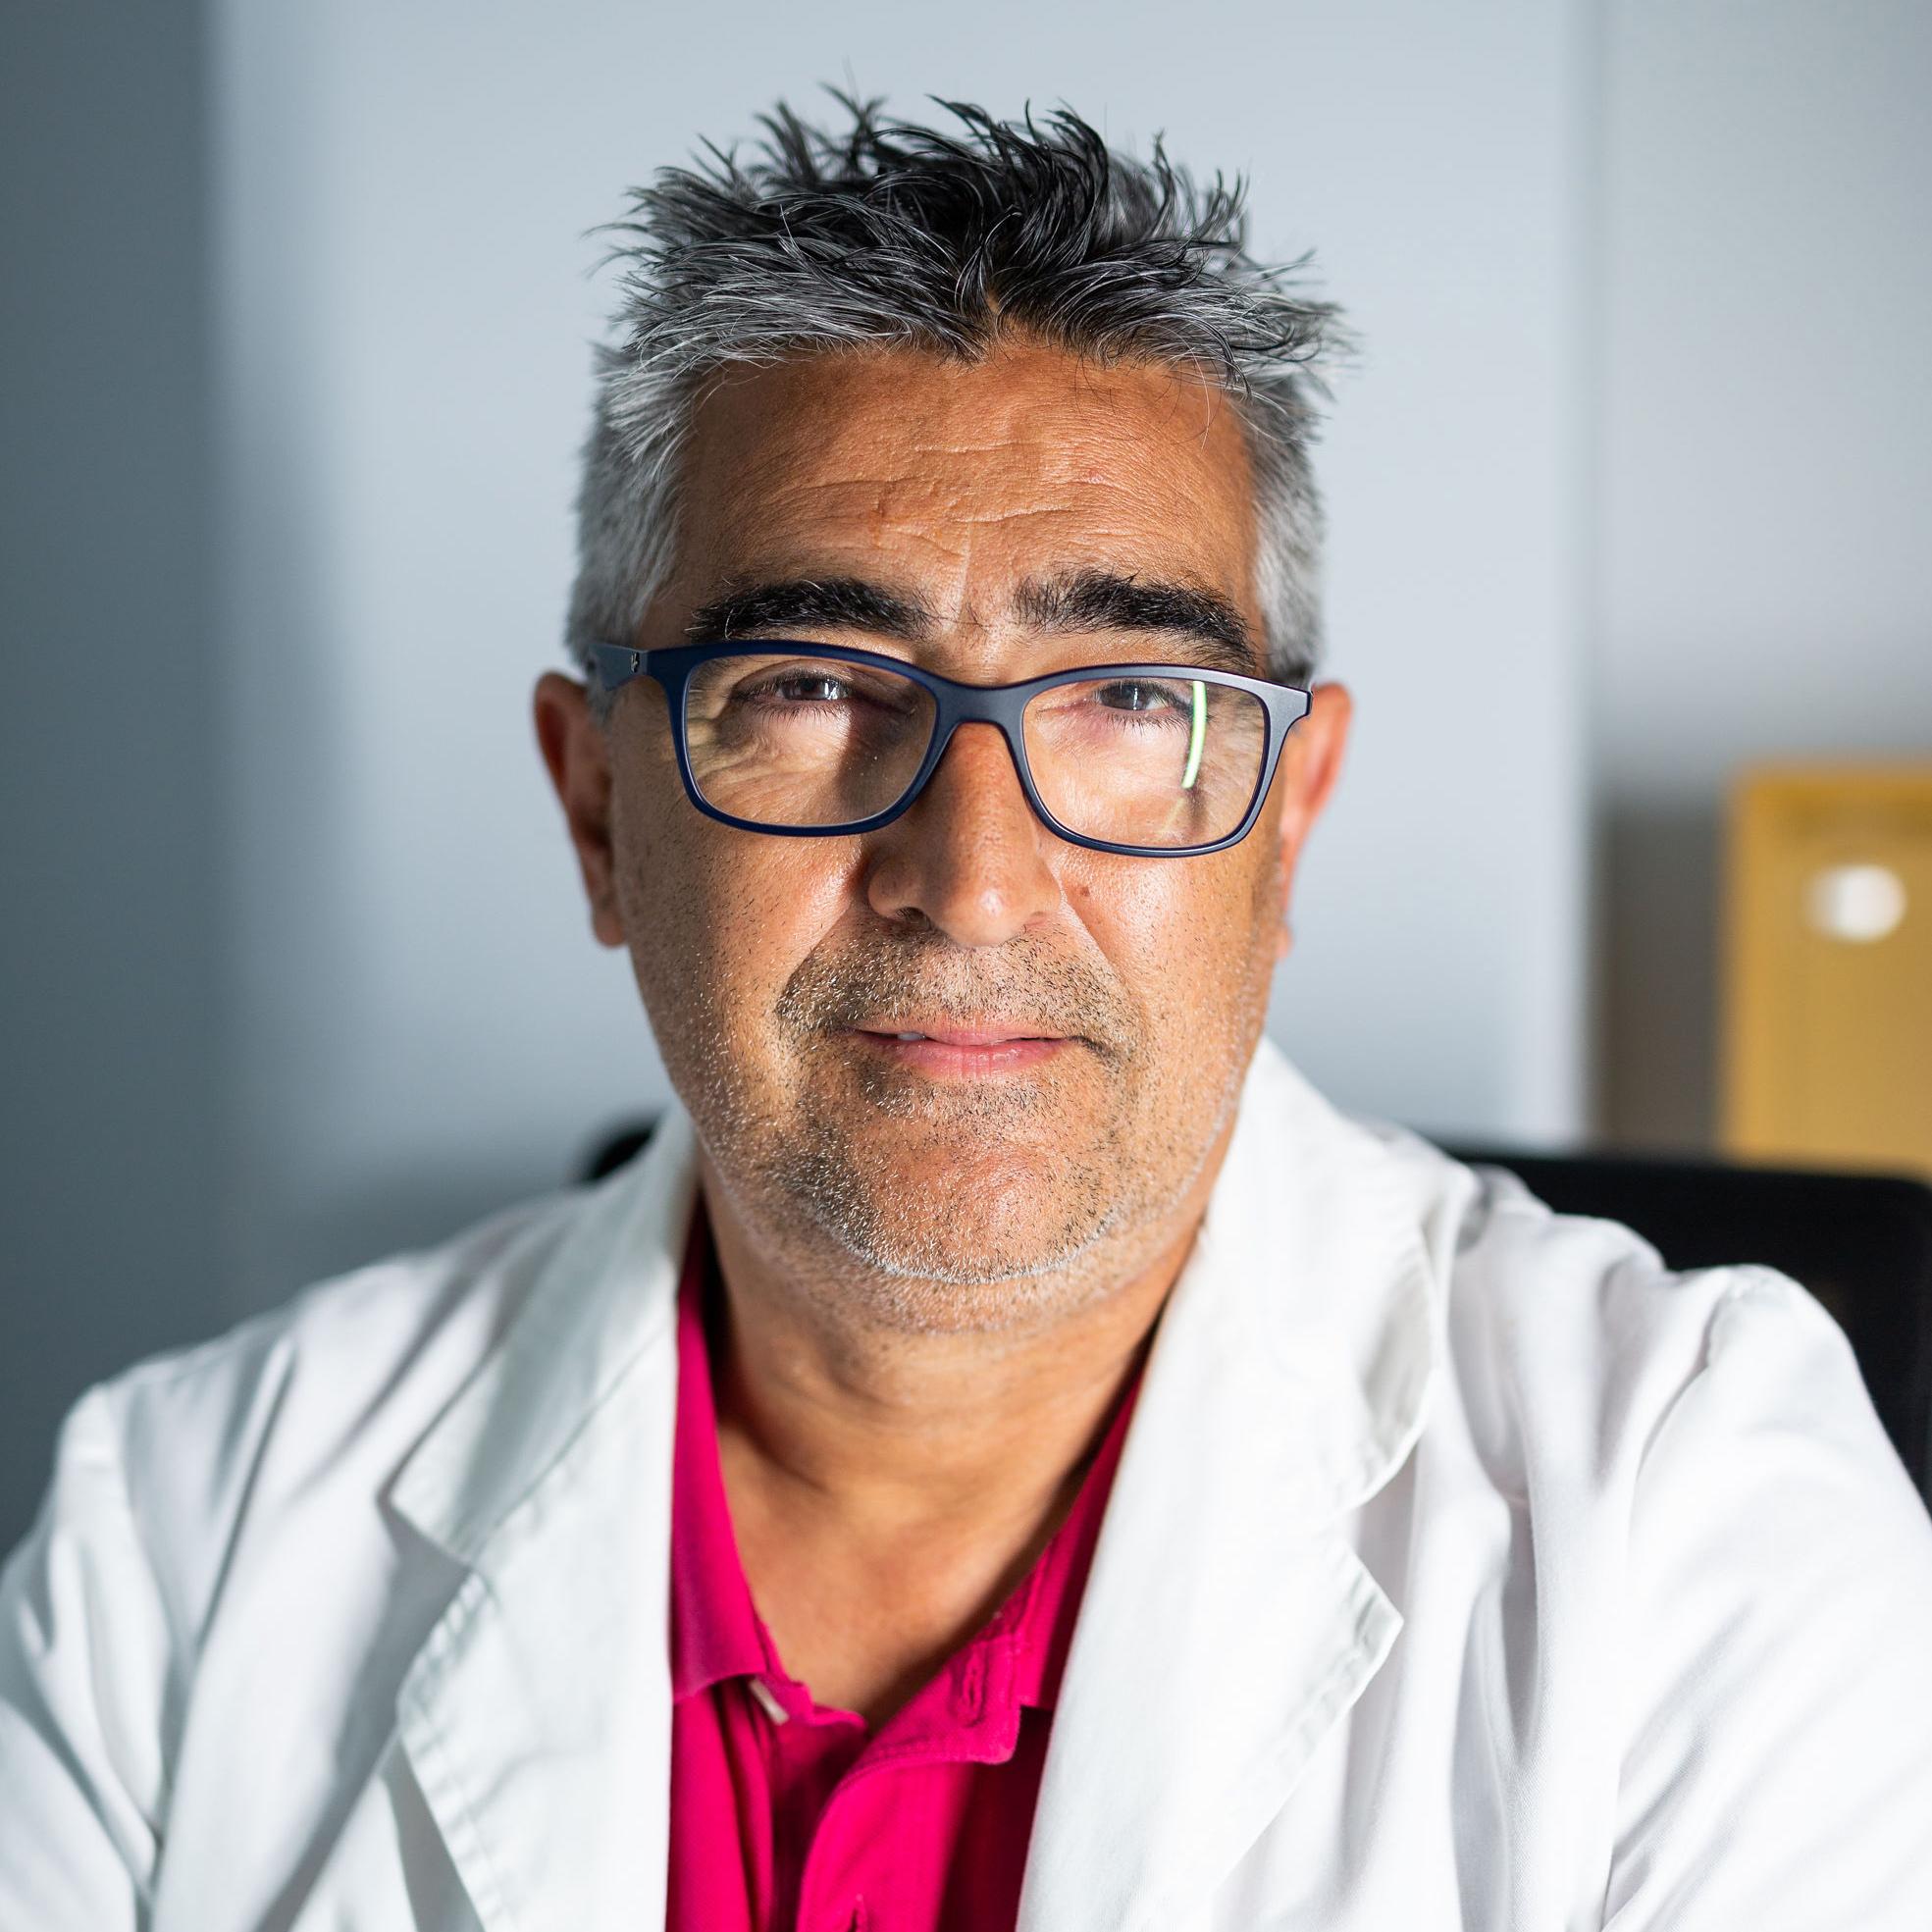 Dr. Cherichetti